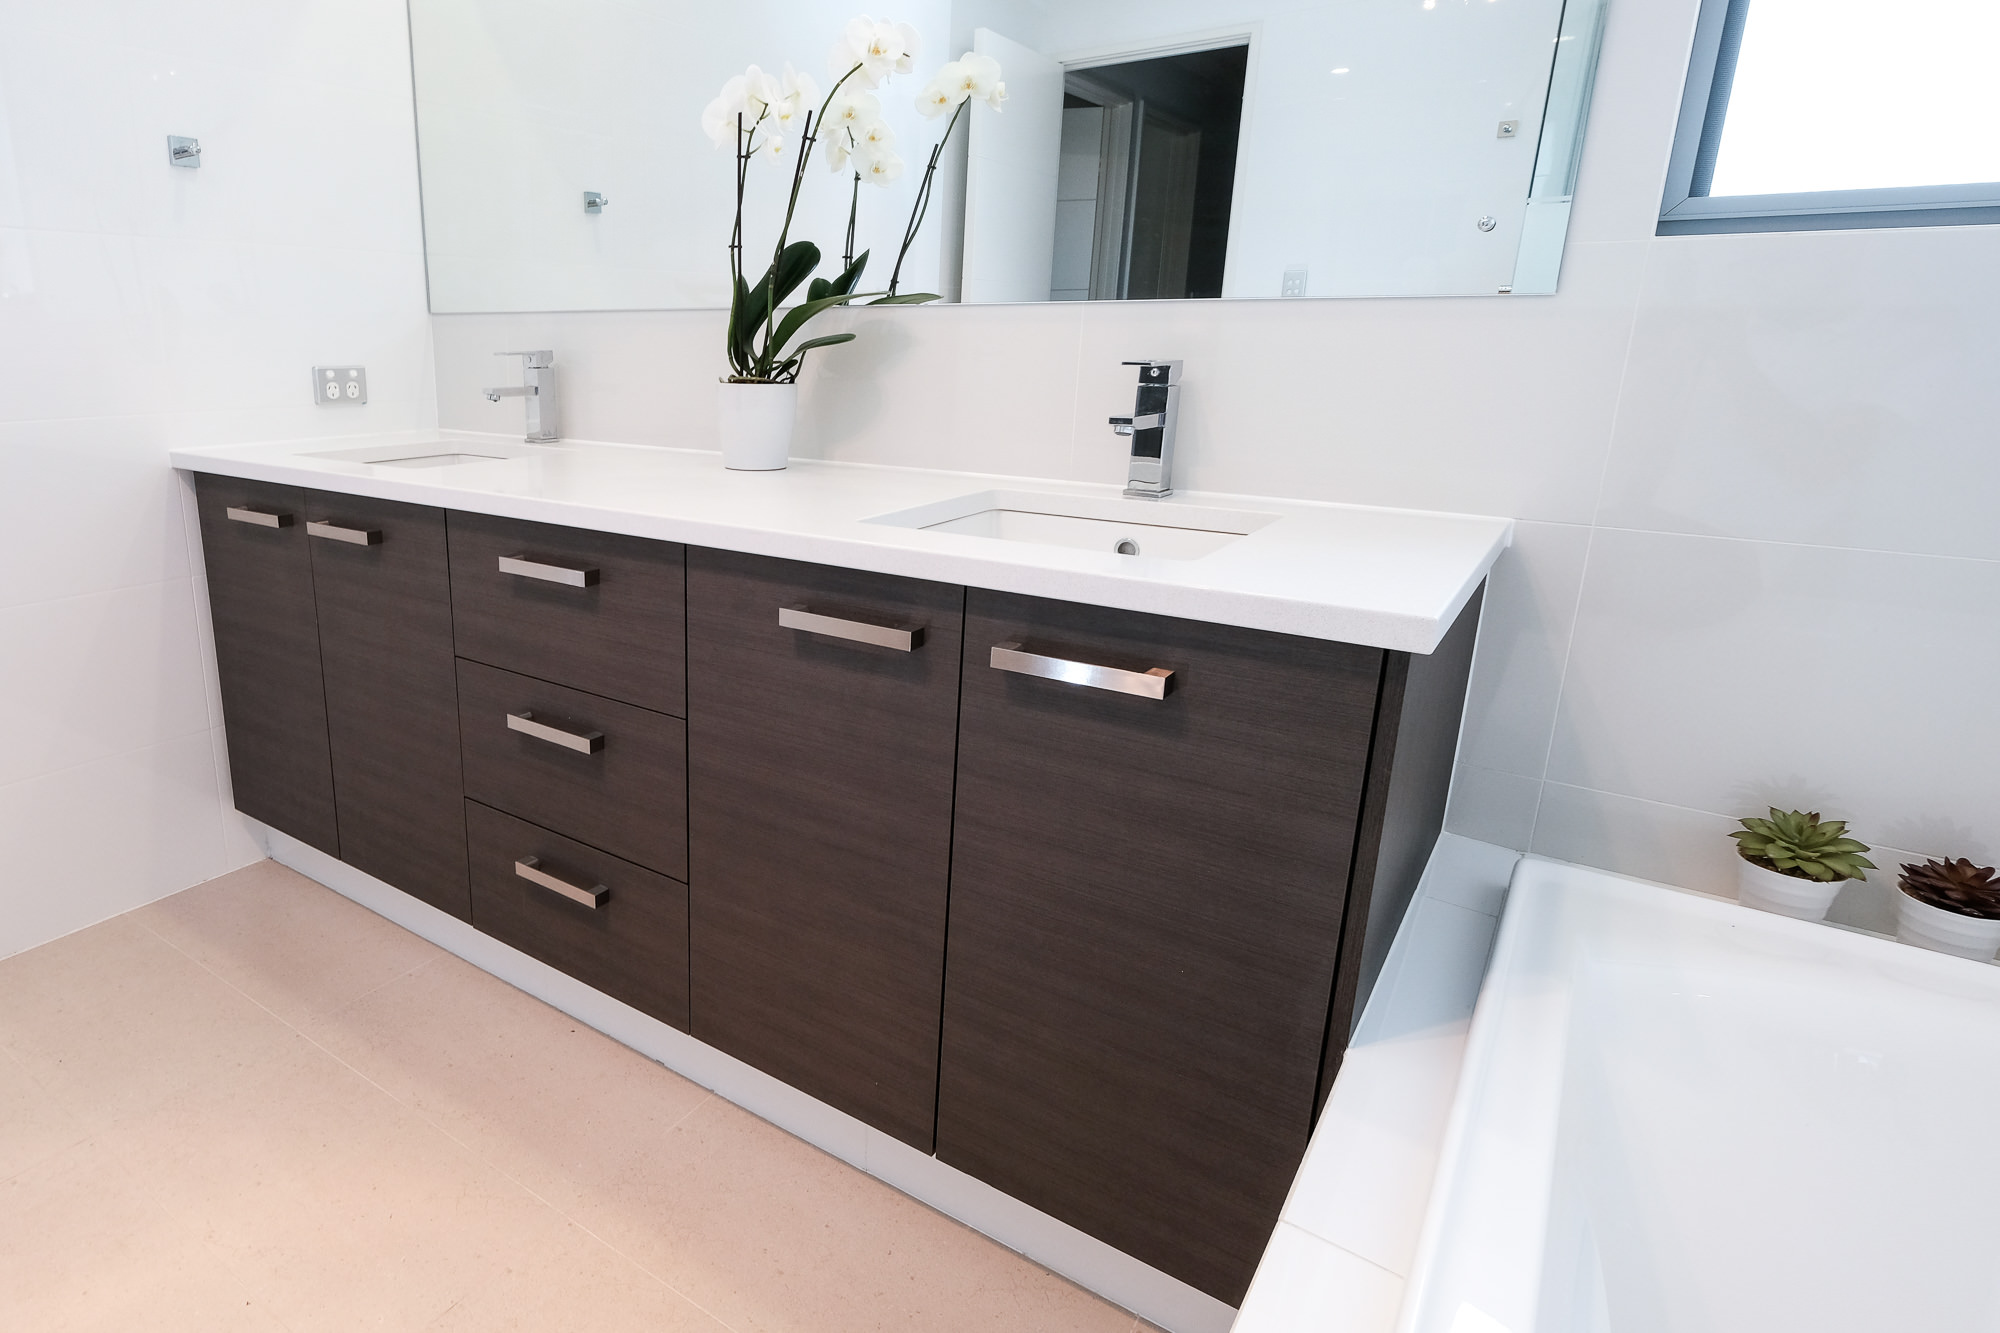 Bathrooms Kitchen Cabinets Perth Home Theatre Cabinets